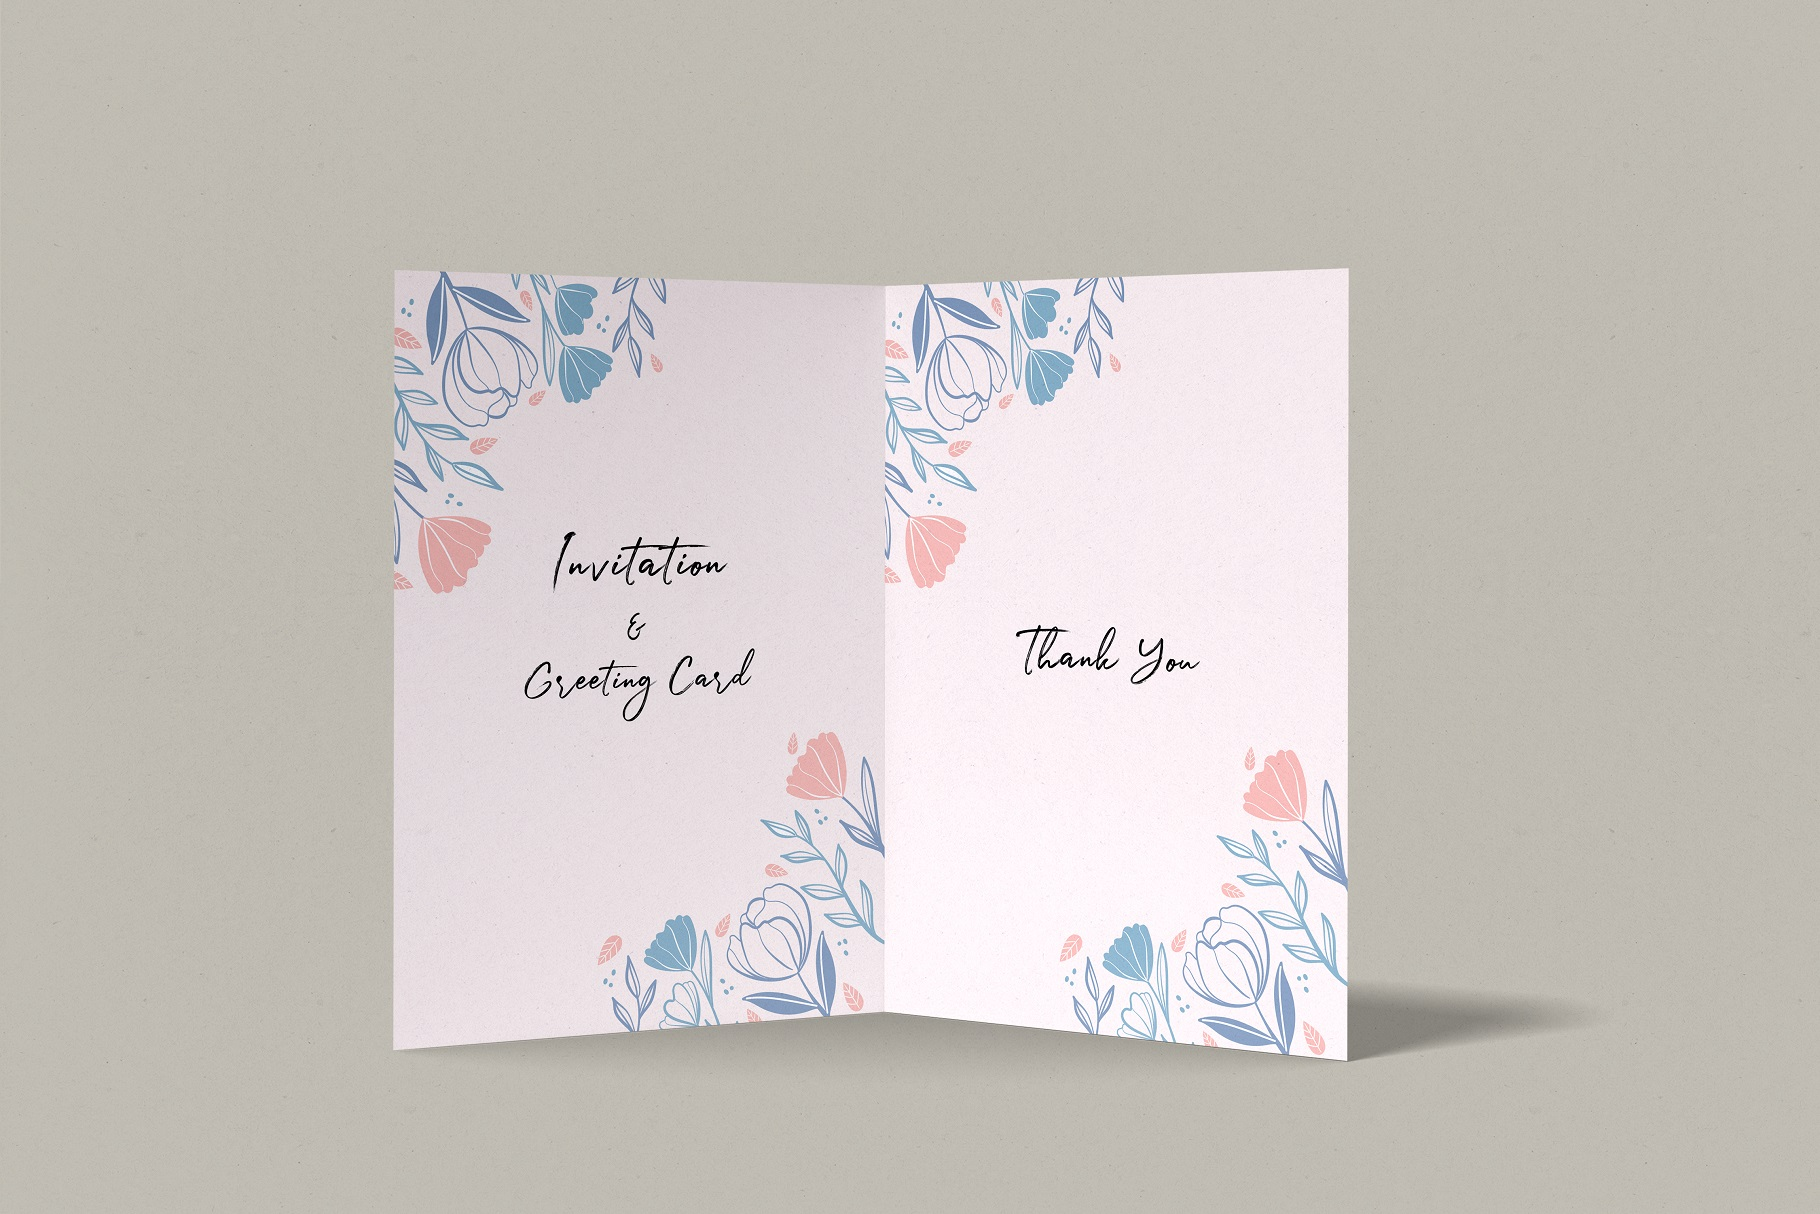 Invitation & Greeting Card Mockup example image 9